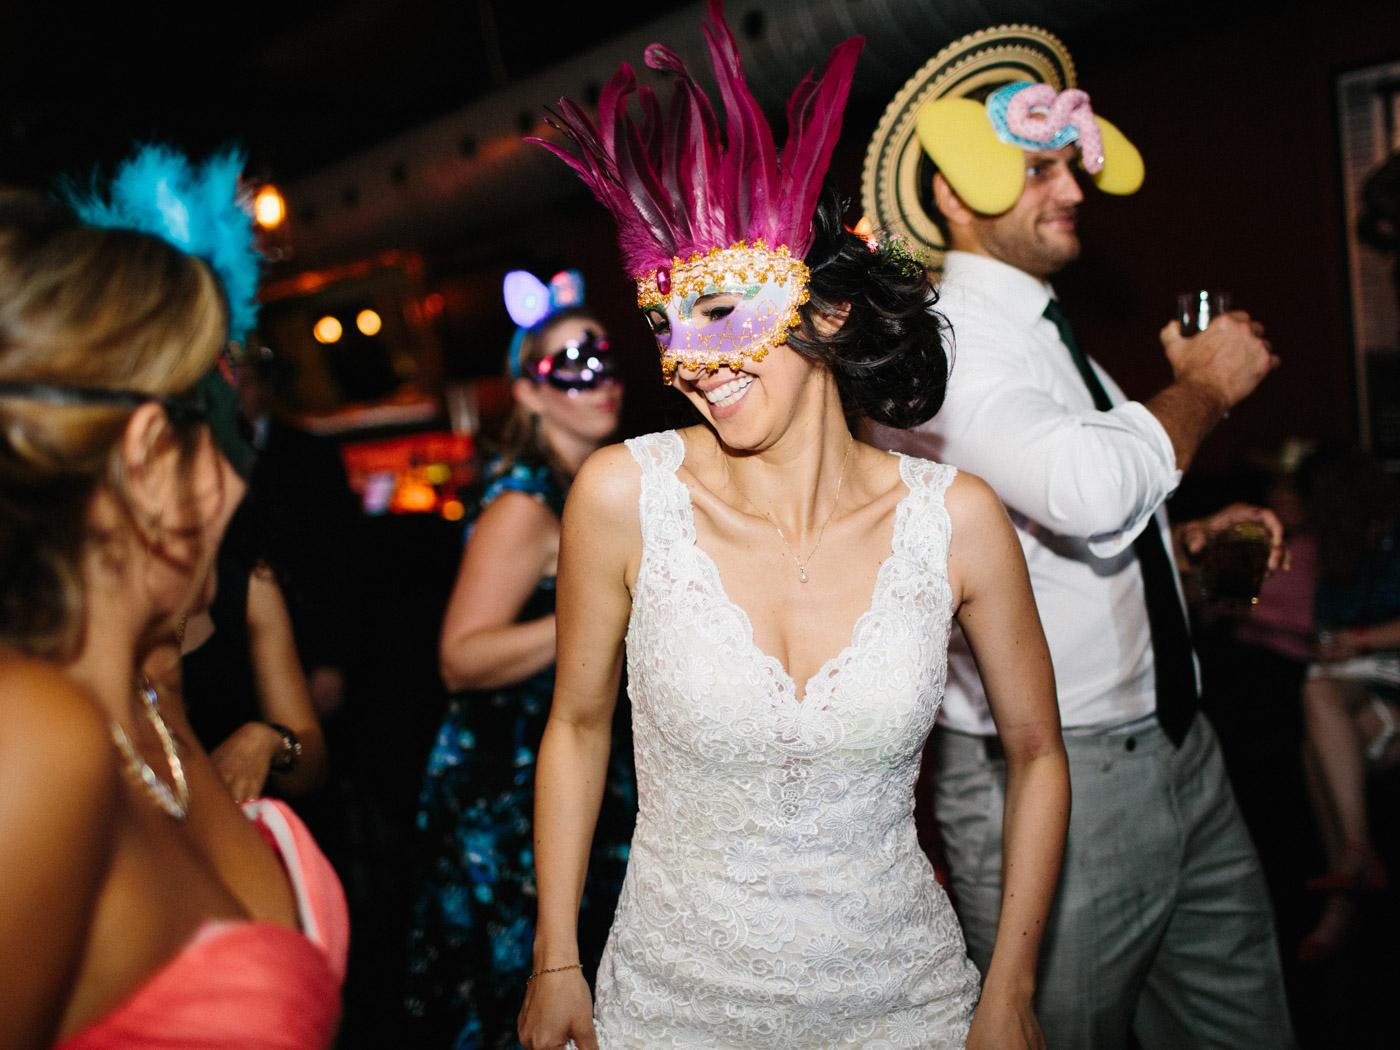 toronto_wedding_photographer_fine_art_documentary-653.jpg